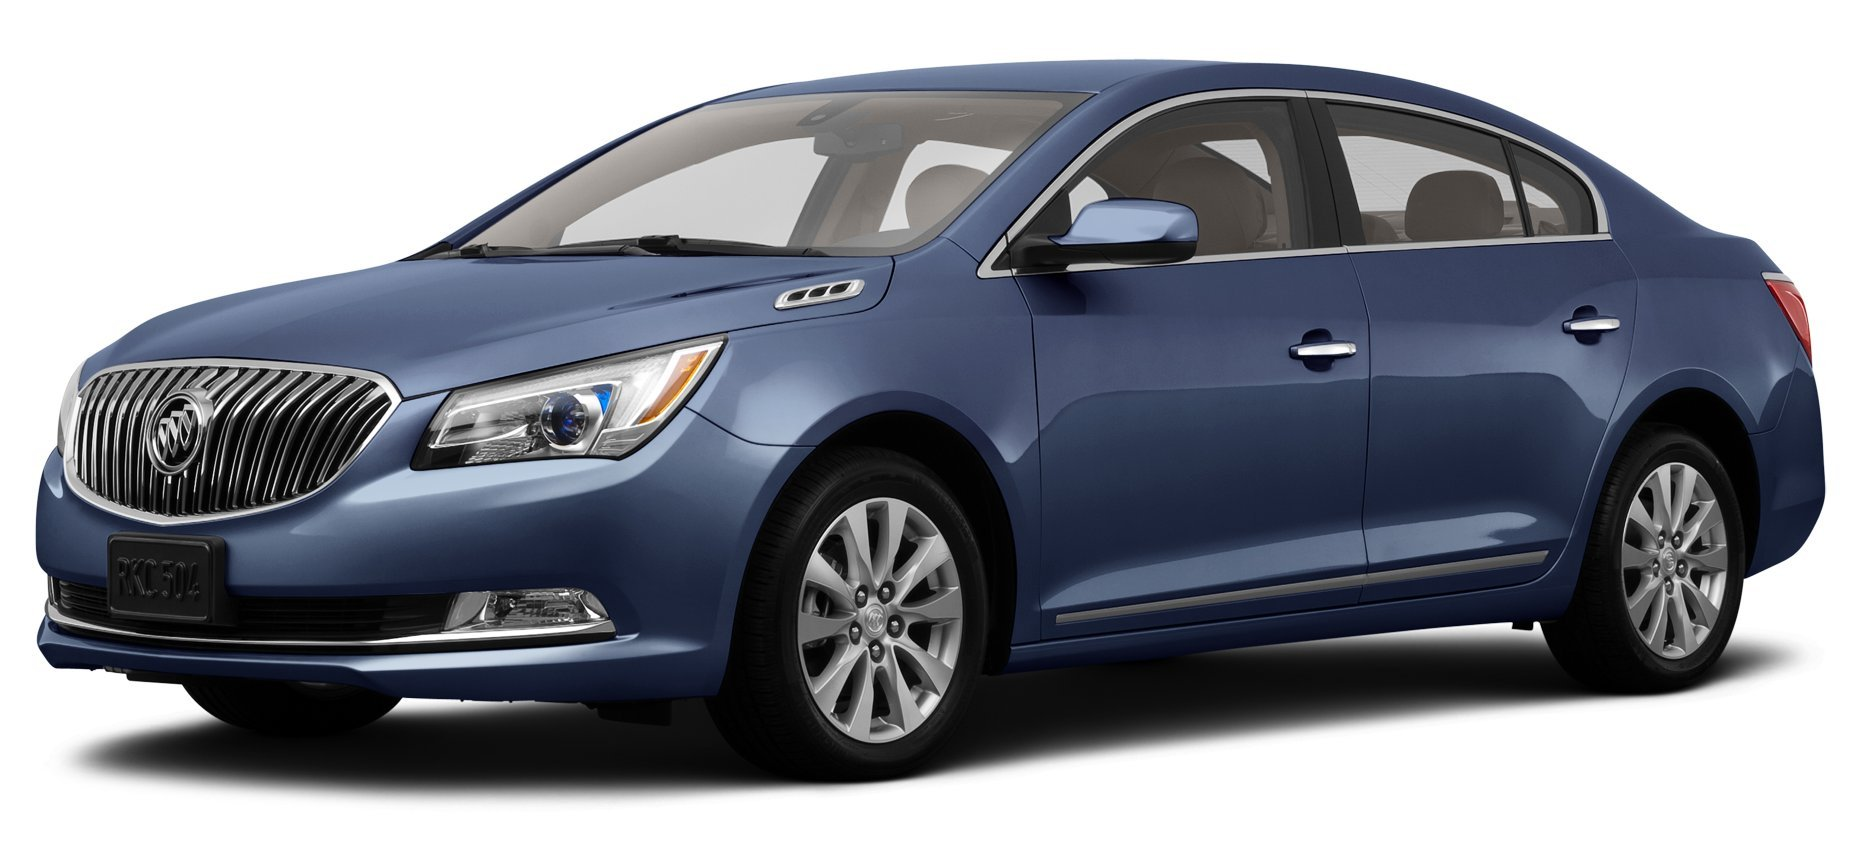 Buick LaCrosse: Front Storage